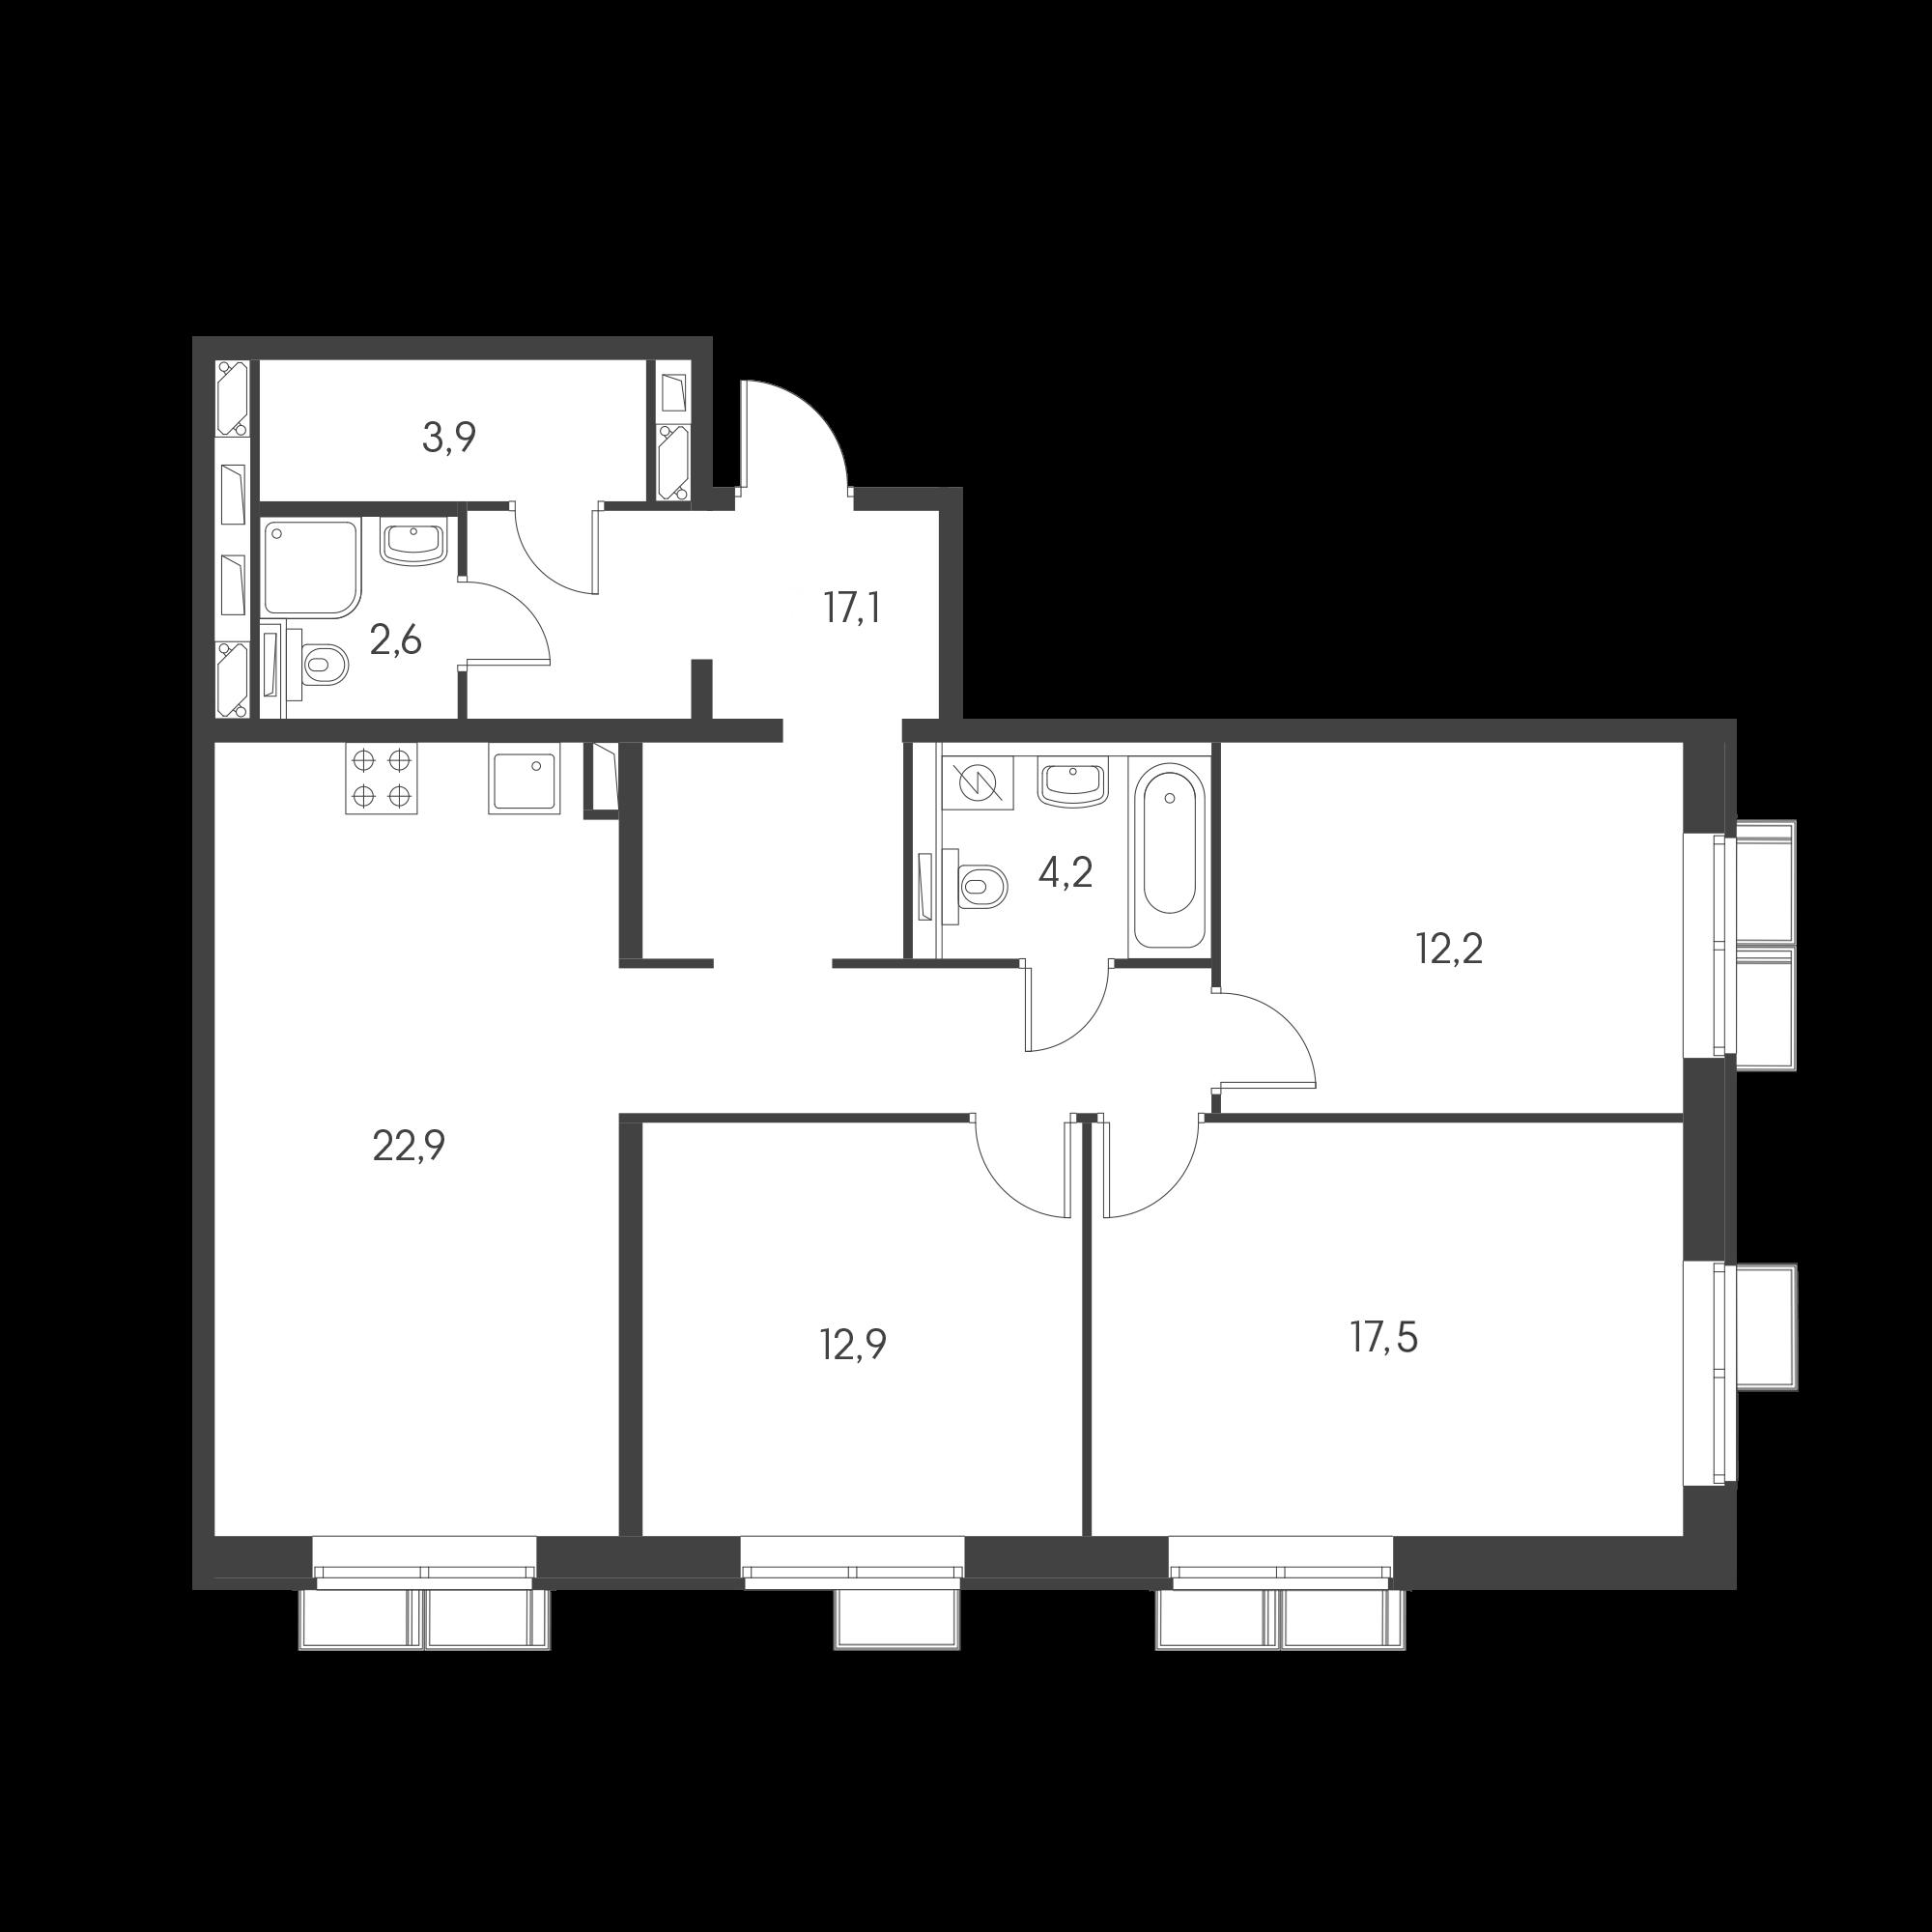 3EL23_10.5-3